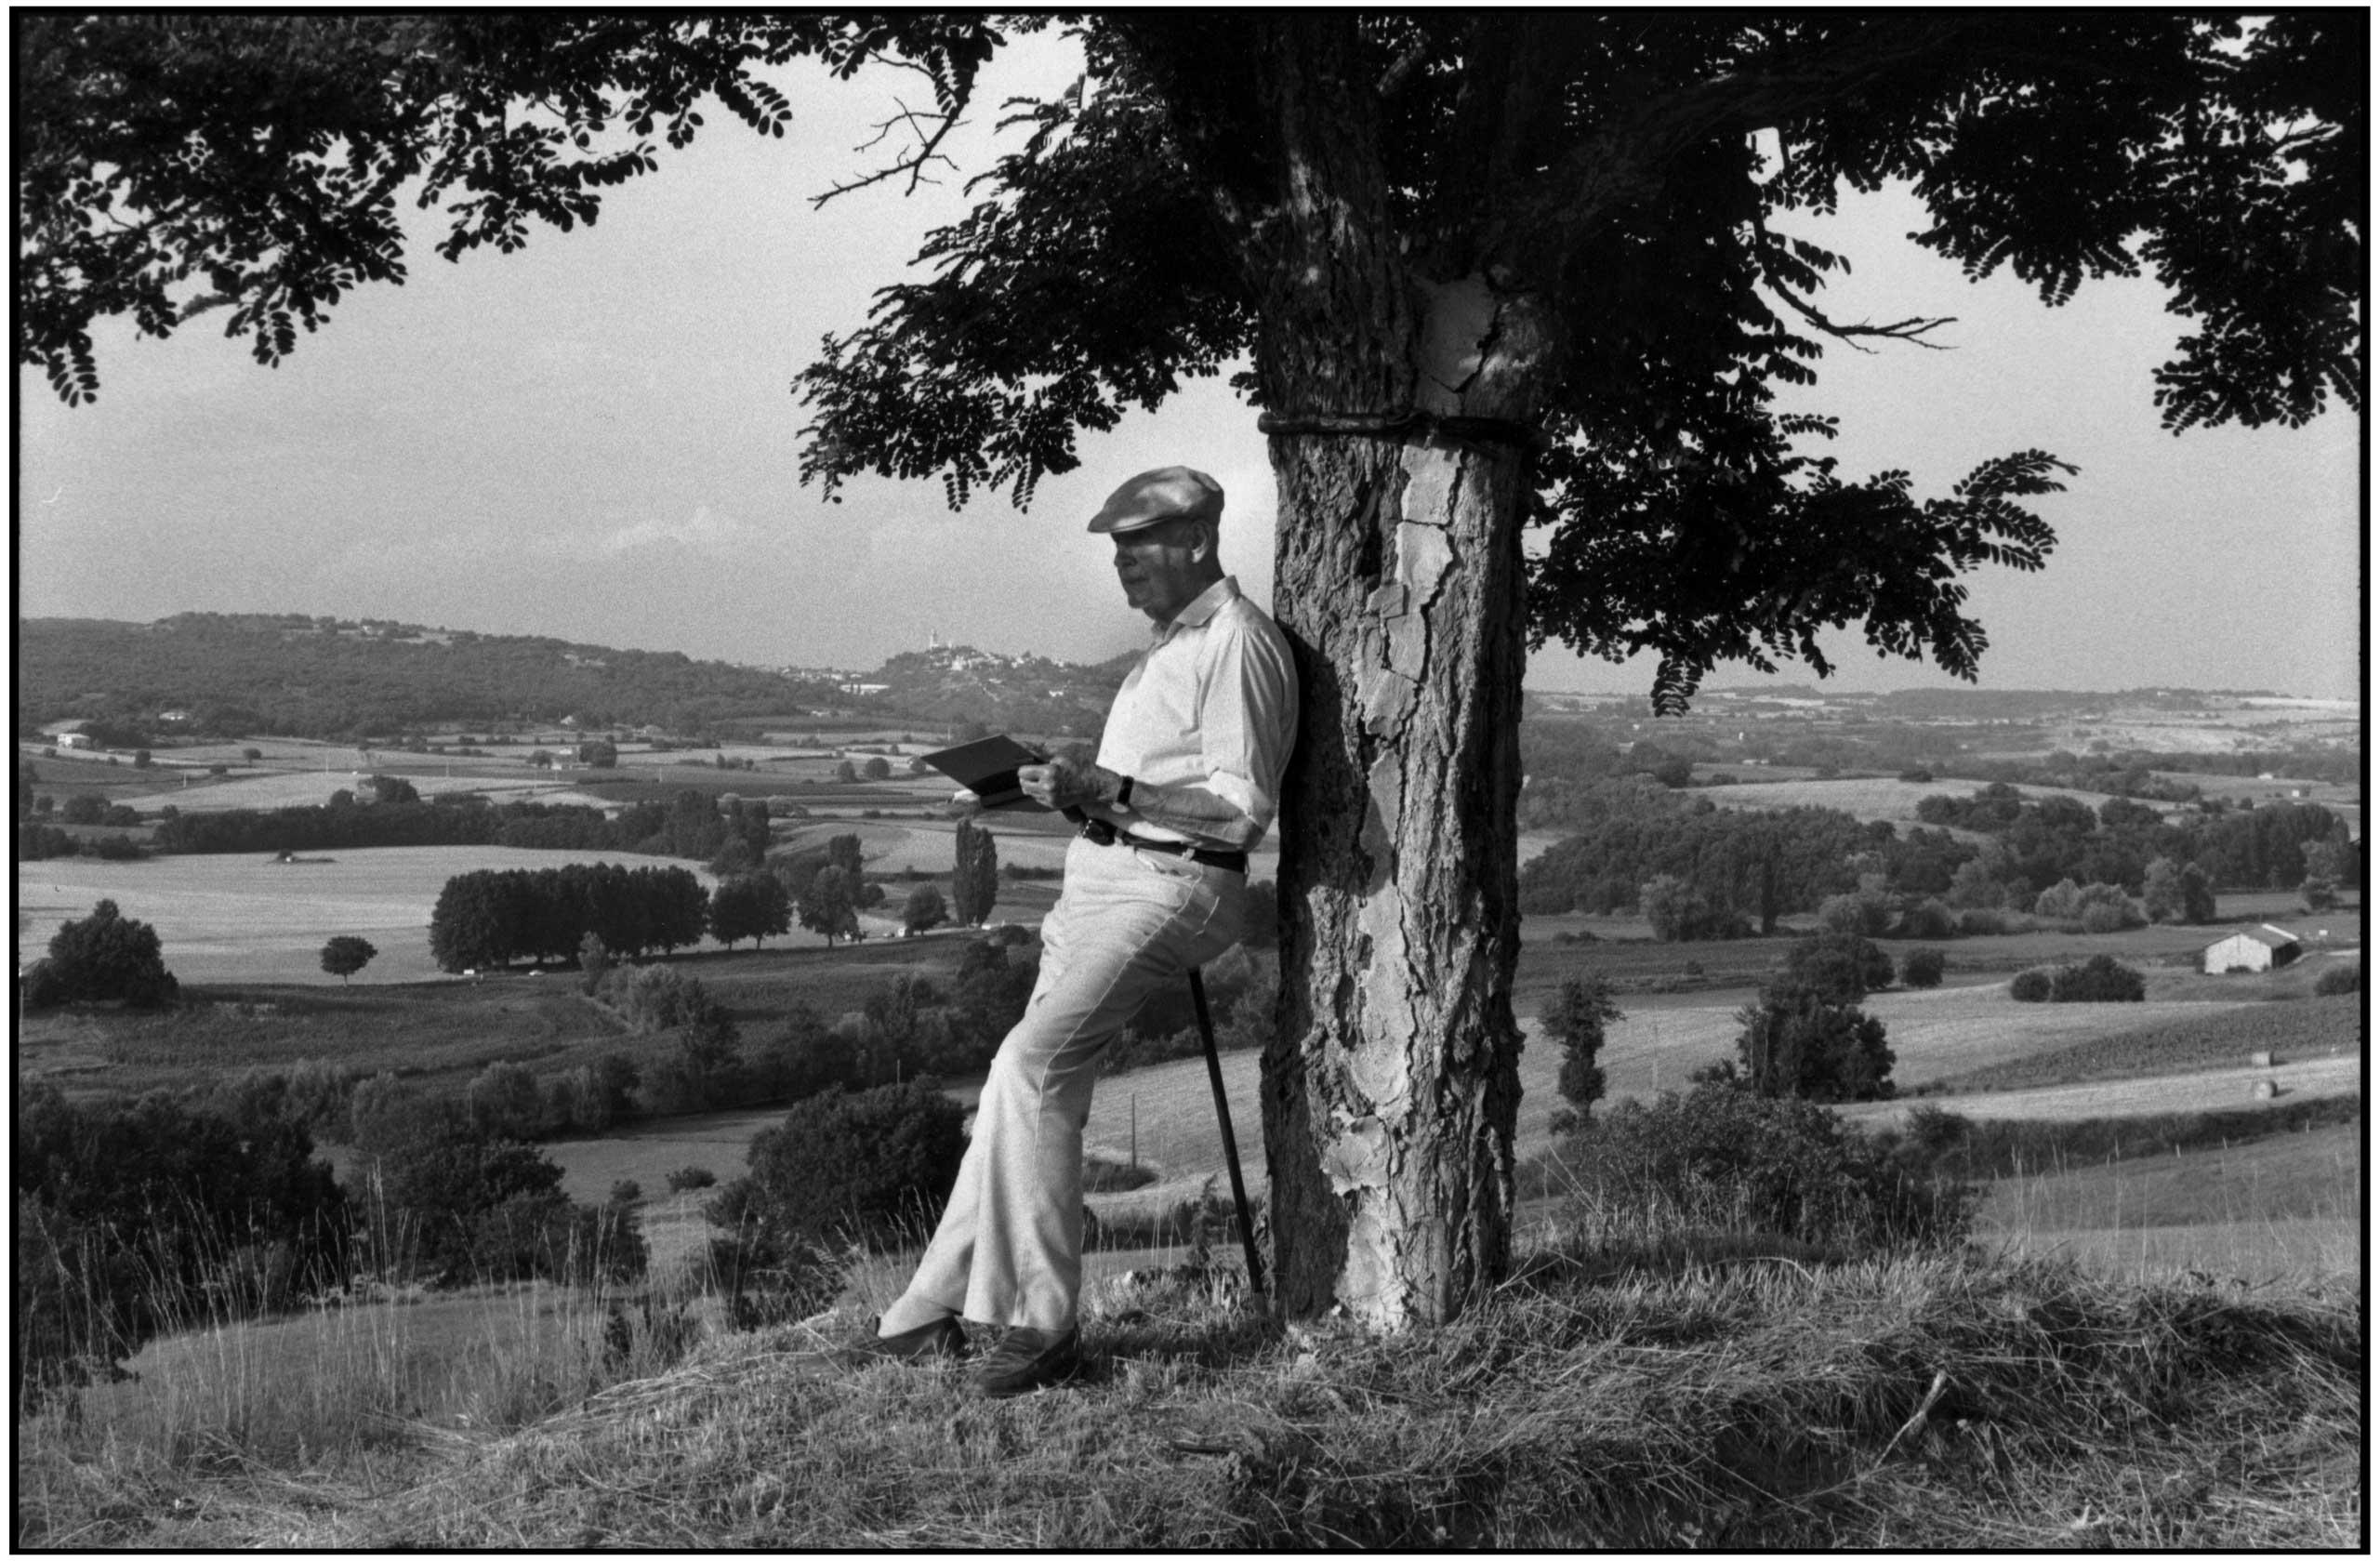 Henri Cartier-Bresson in Provence-Alpes-C™te d'Azur region, 1995.